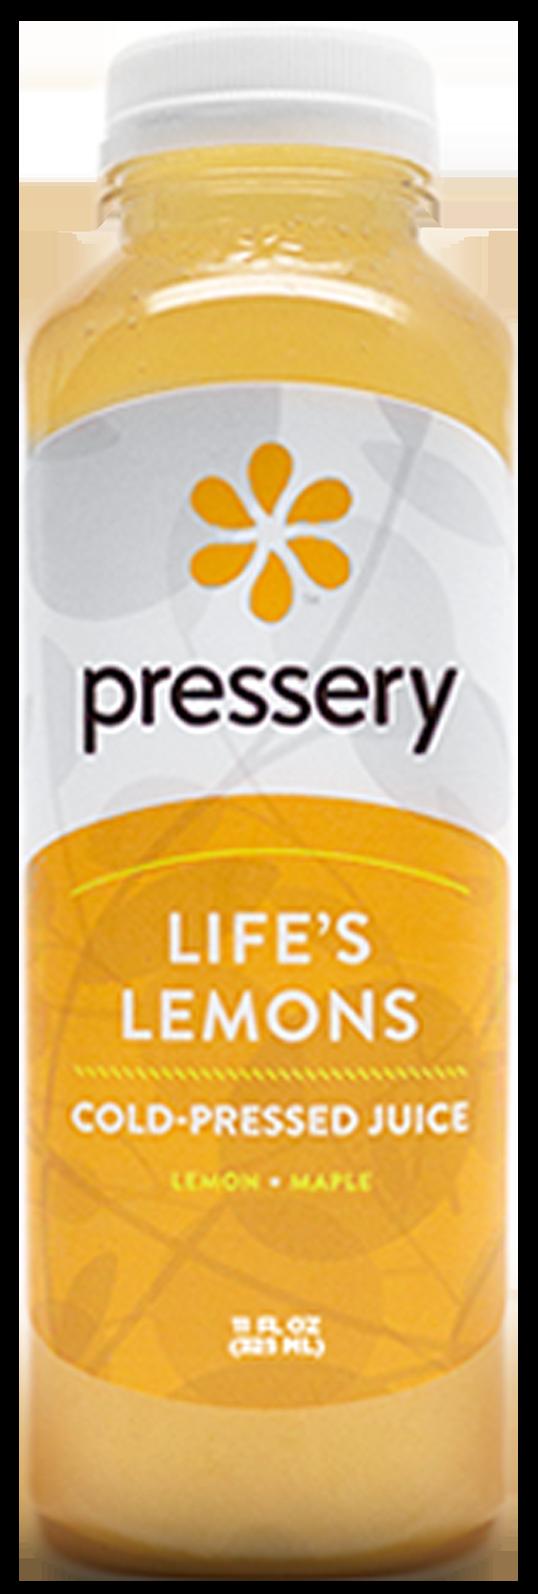 Lifes_Lemons.png